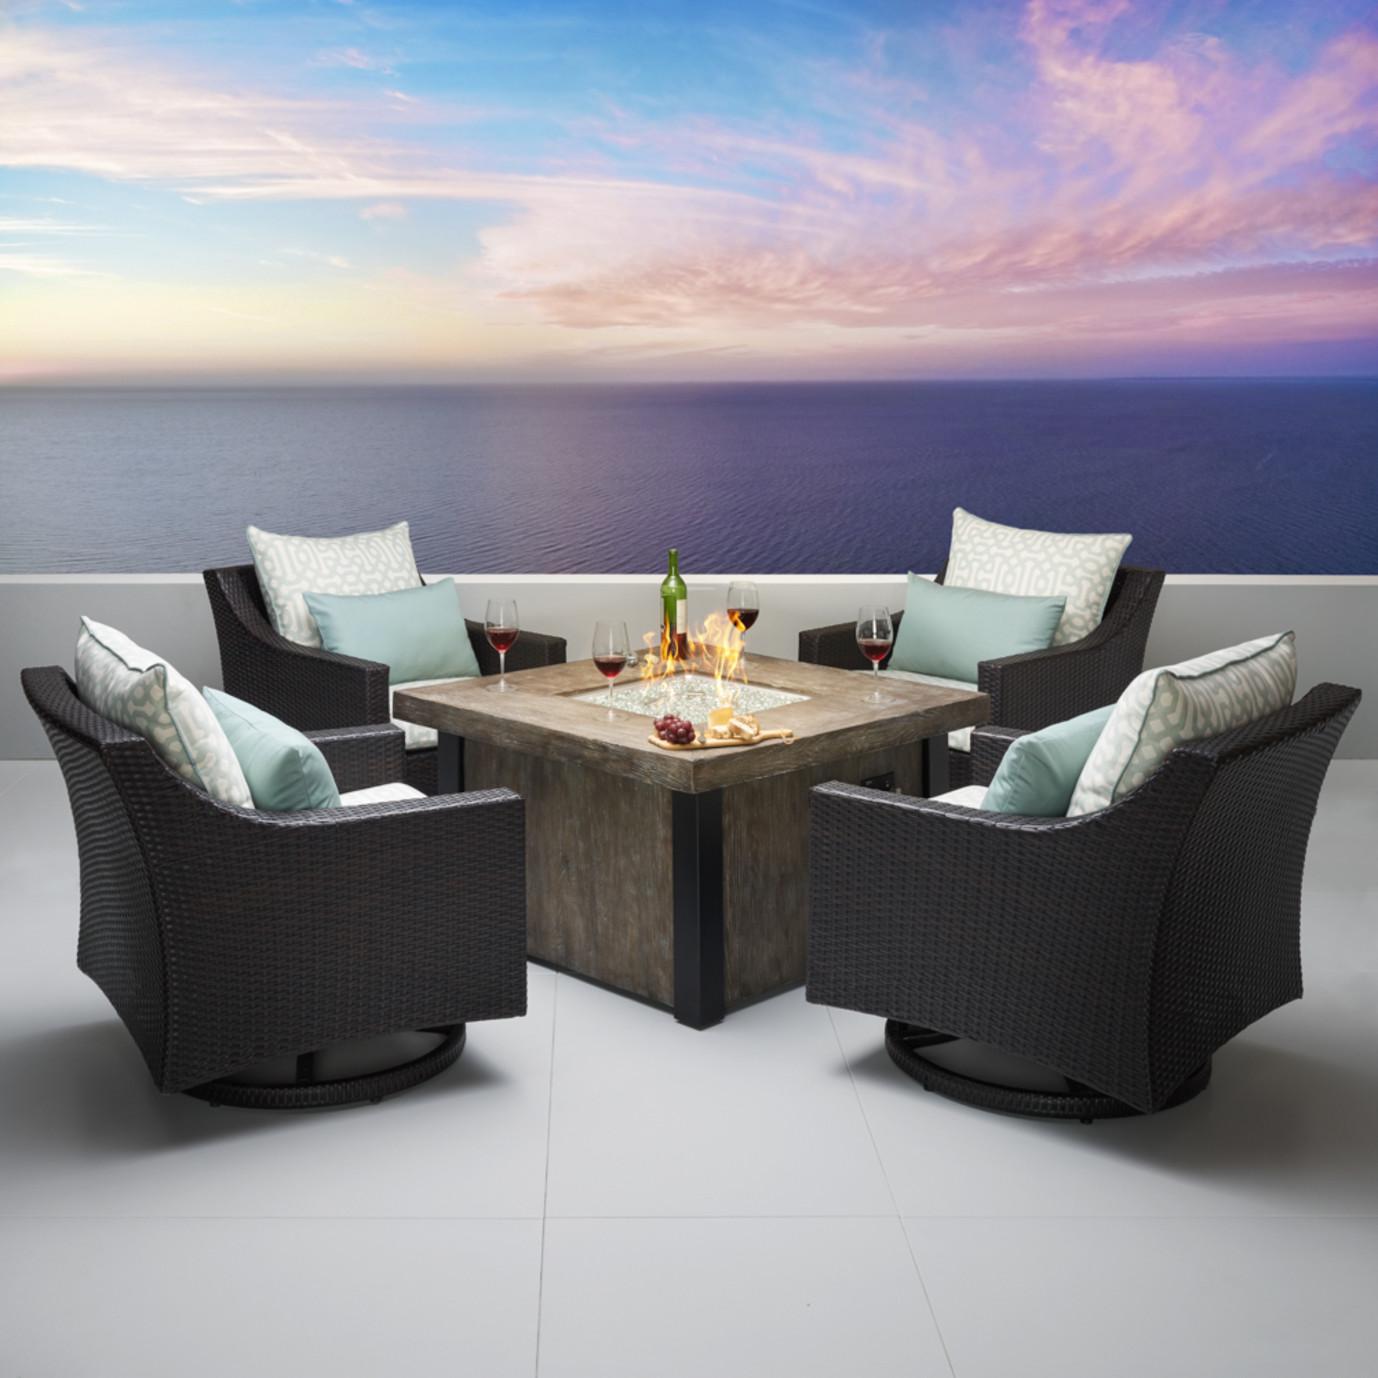 Deco™ Deluxe 5pc Motion Fire Chat Set - Designer Spa Blue